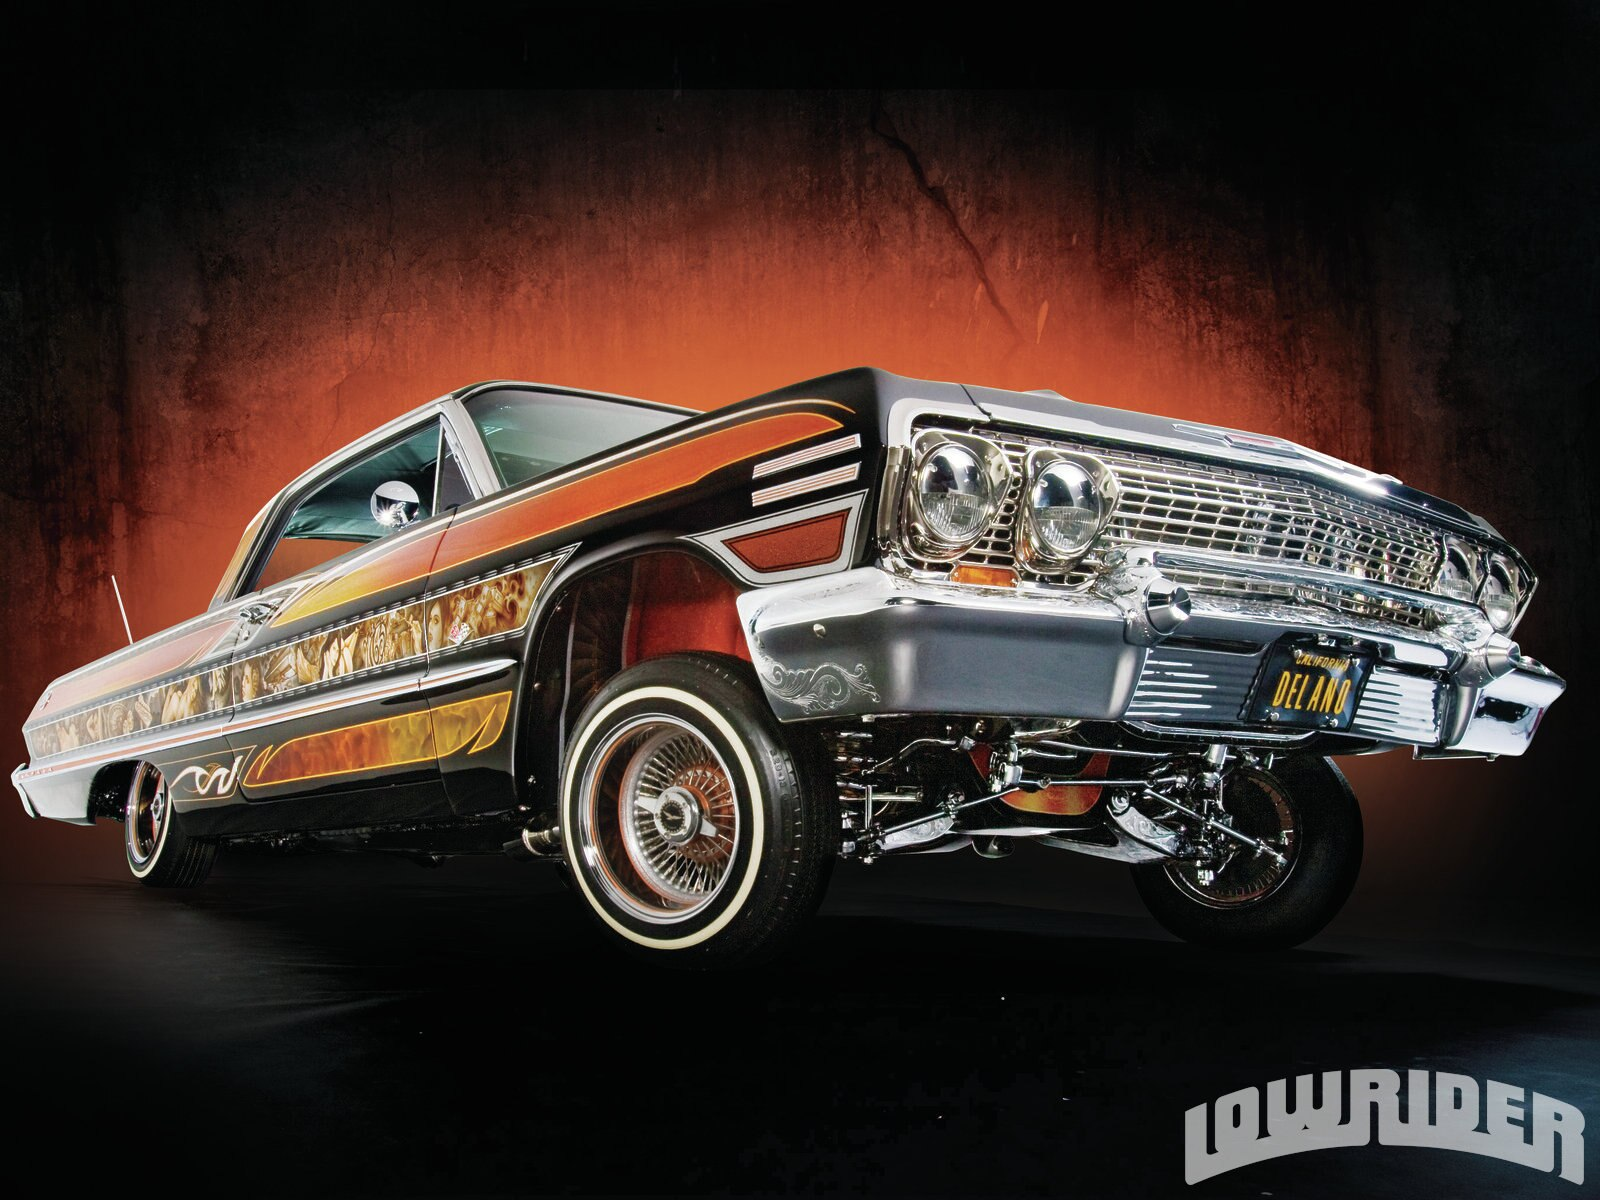 lrmp-1108-05-z-1963-chevrolet-impala-front-view2